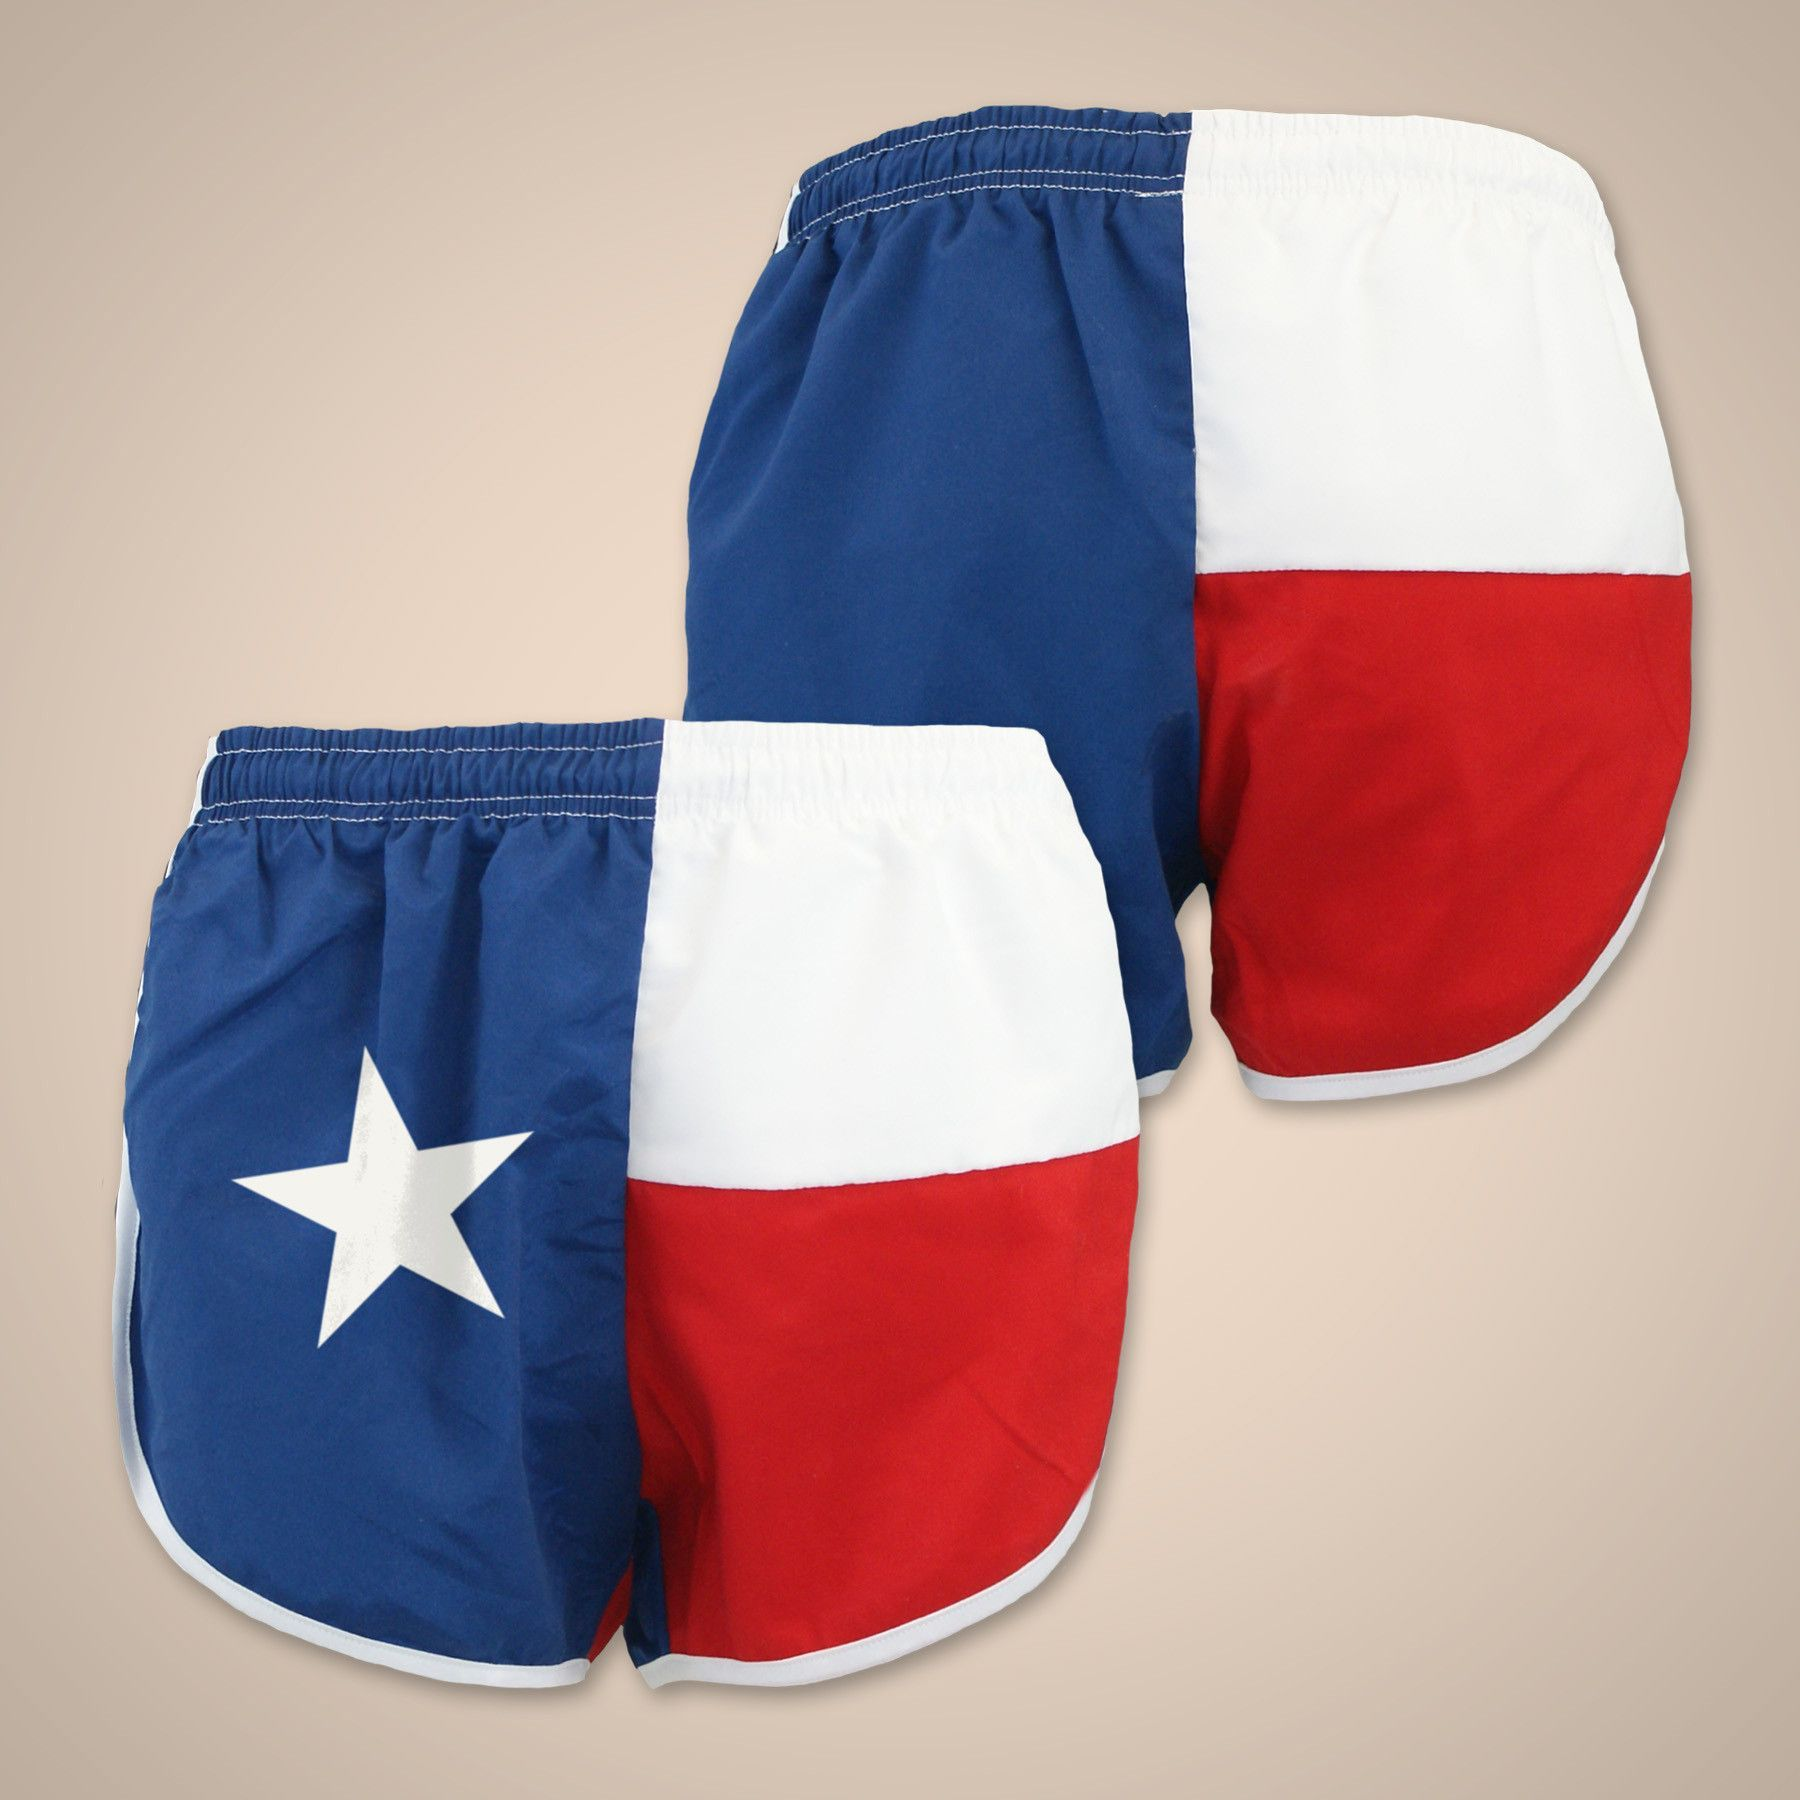 Flag Short Texas Texas Shorts Texas Fashion Running Clothes